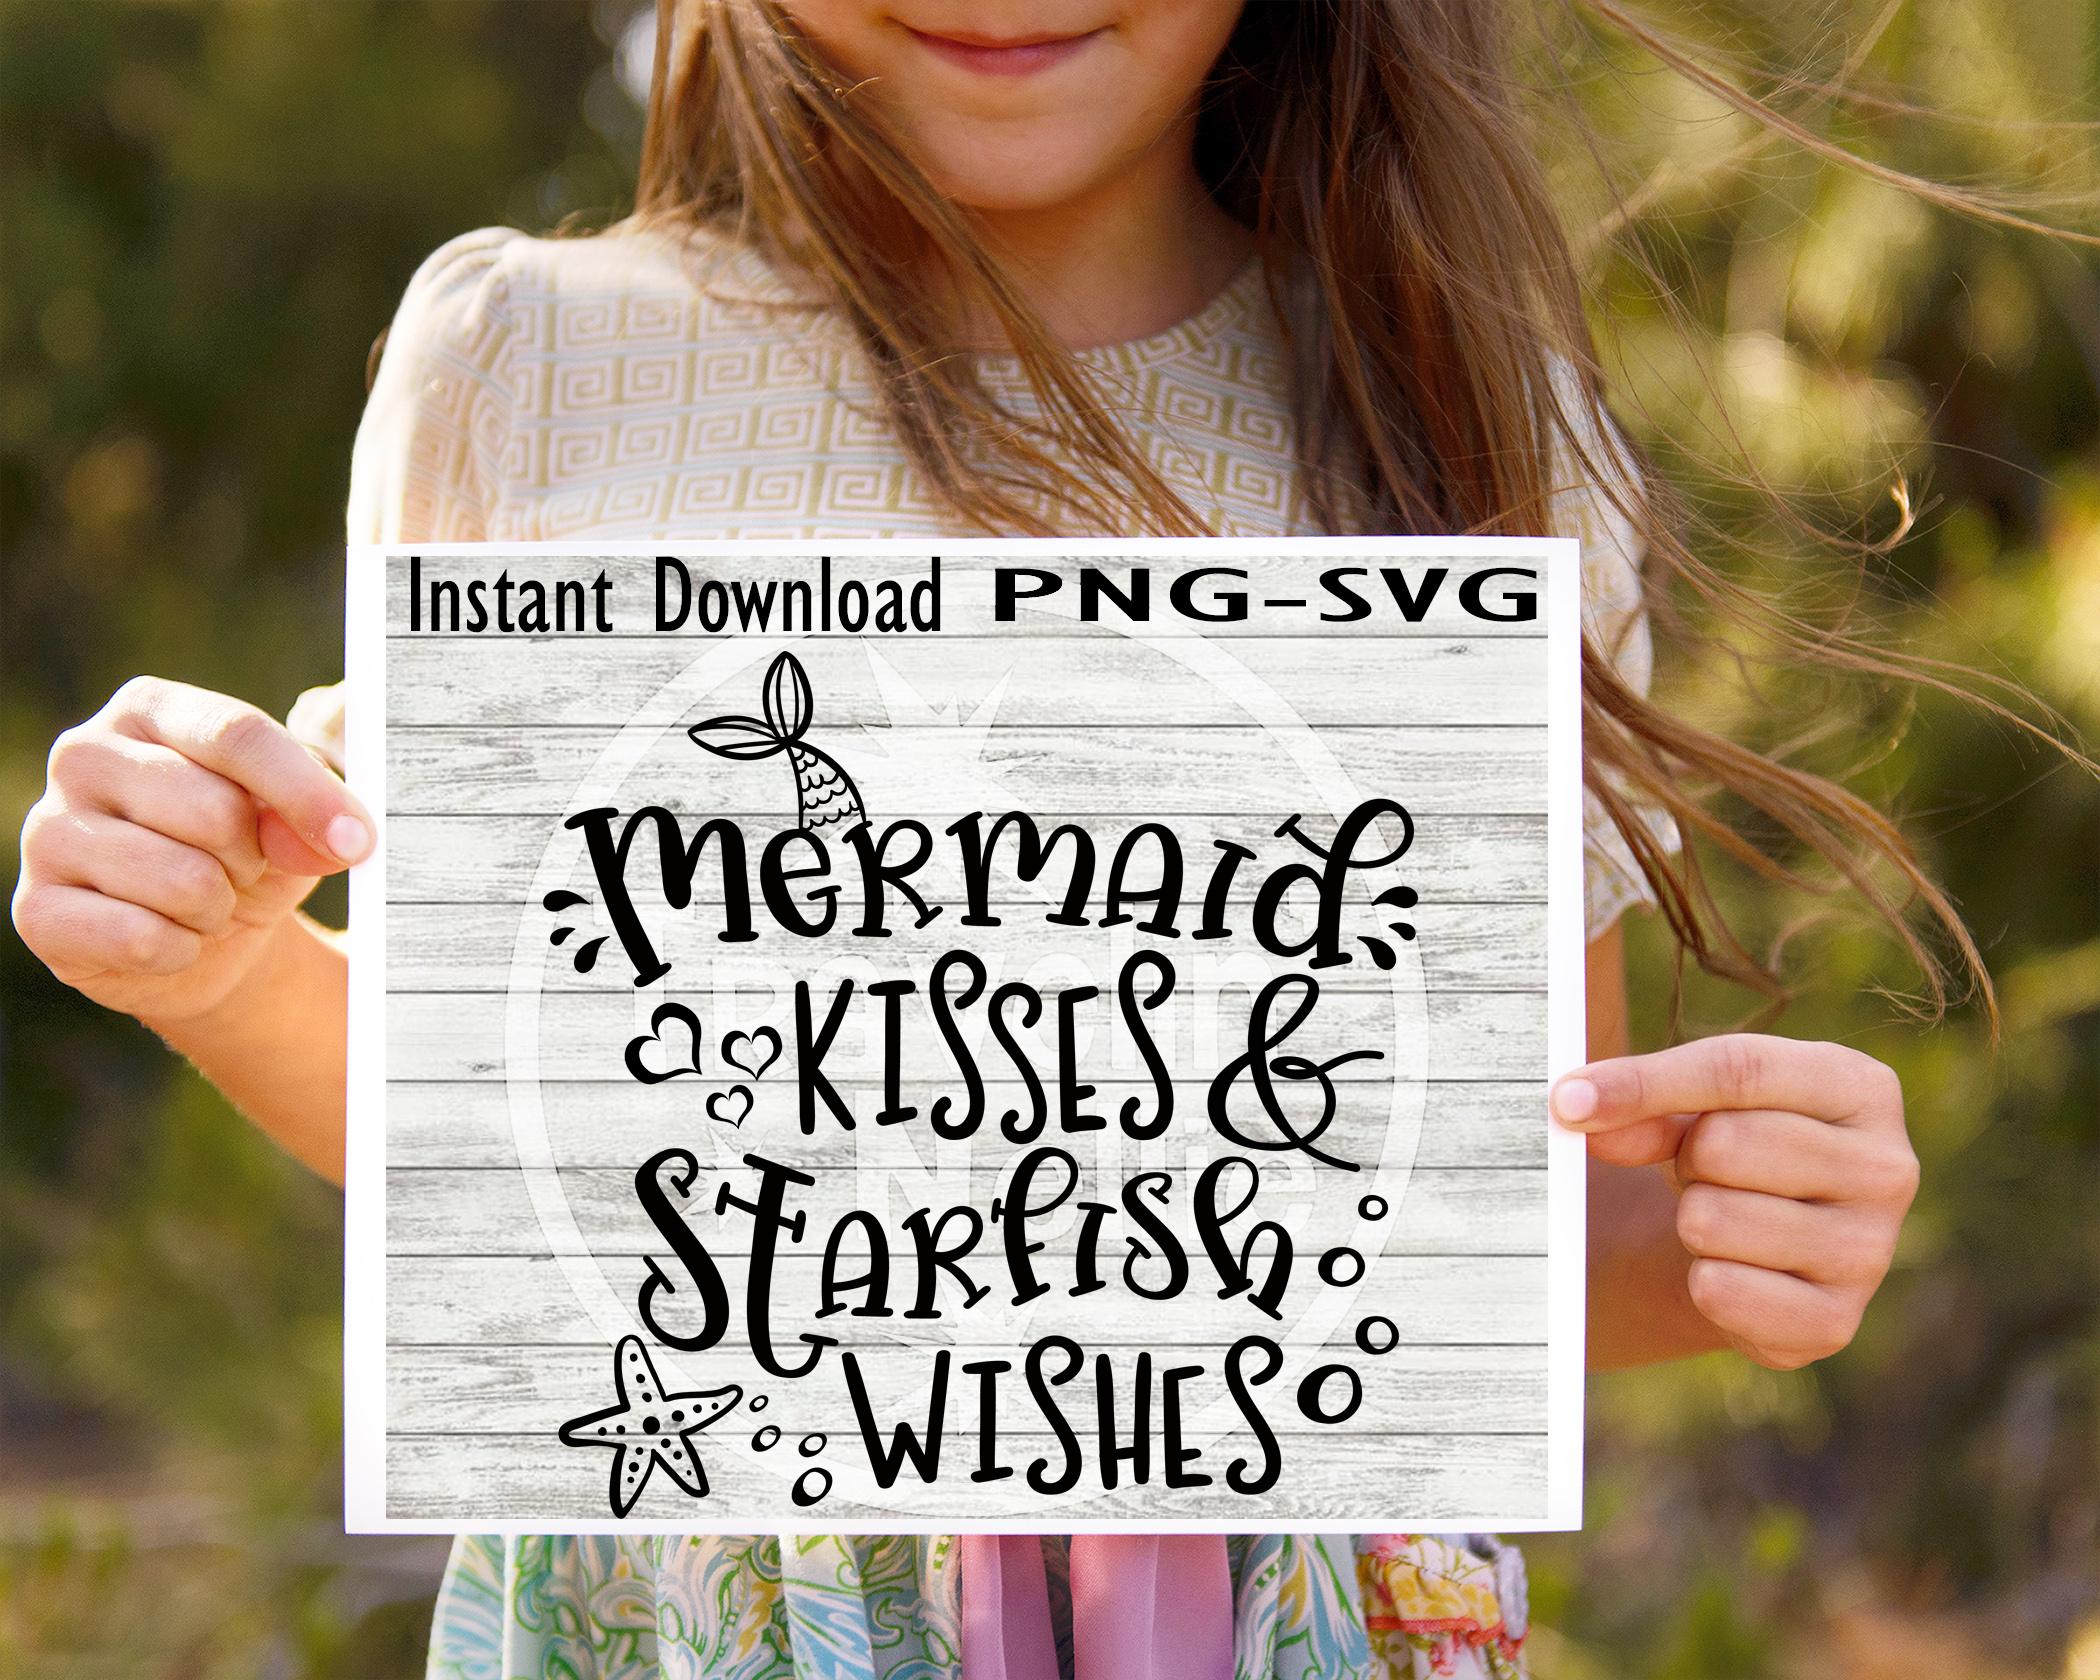 SVG Bundle, Sea SVG, Beach SVG, Collect Memories svg, Wish Upon A Starfish svg, Mermaid Kisses Svg, Starfish Wishes svg, Mermaid svg, SVG for Cricut example image 4